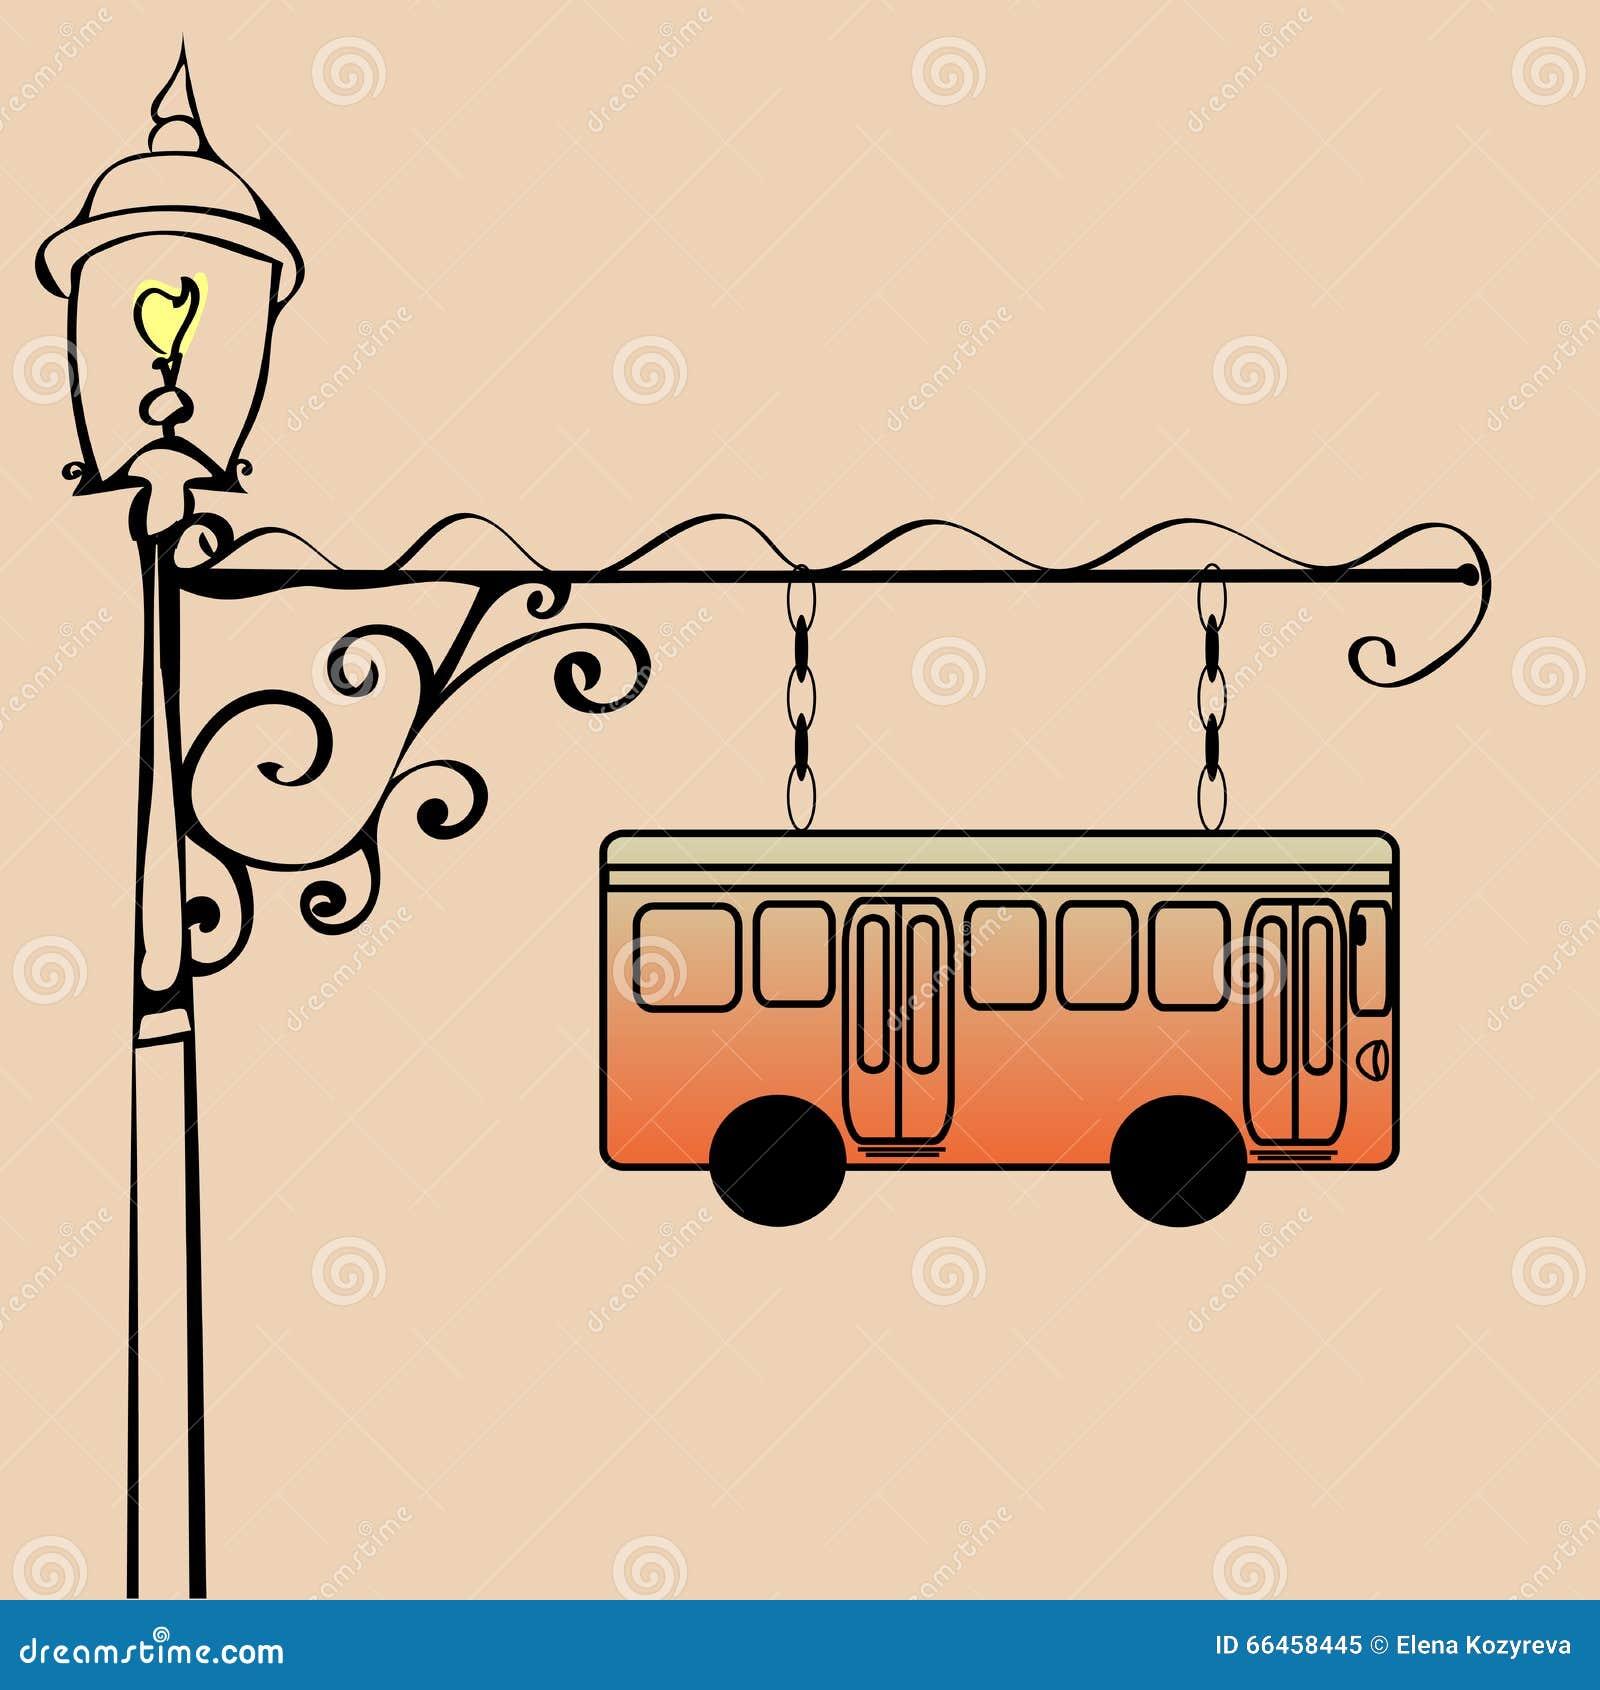 bus stop picture Vintage